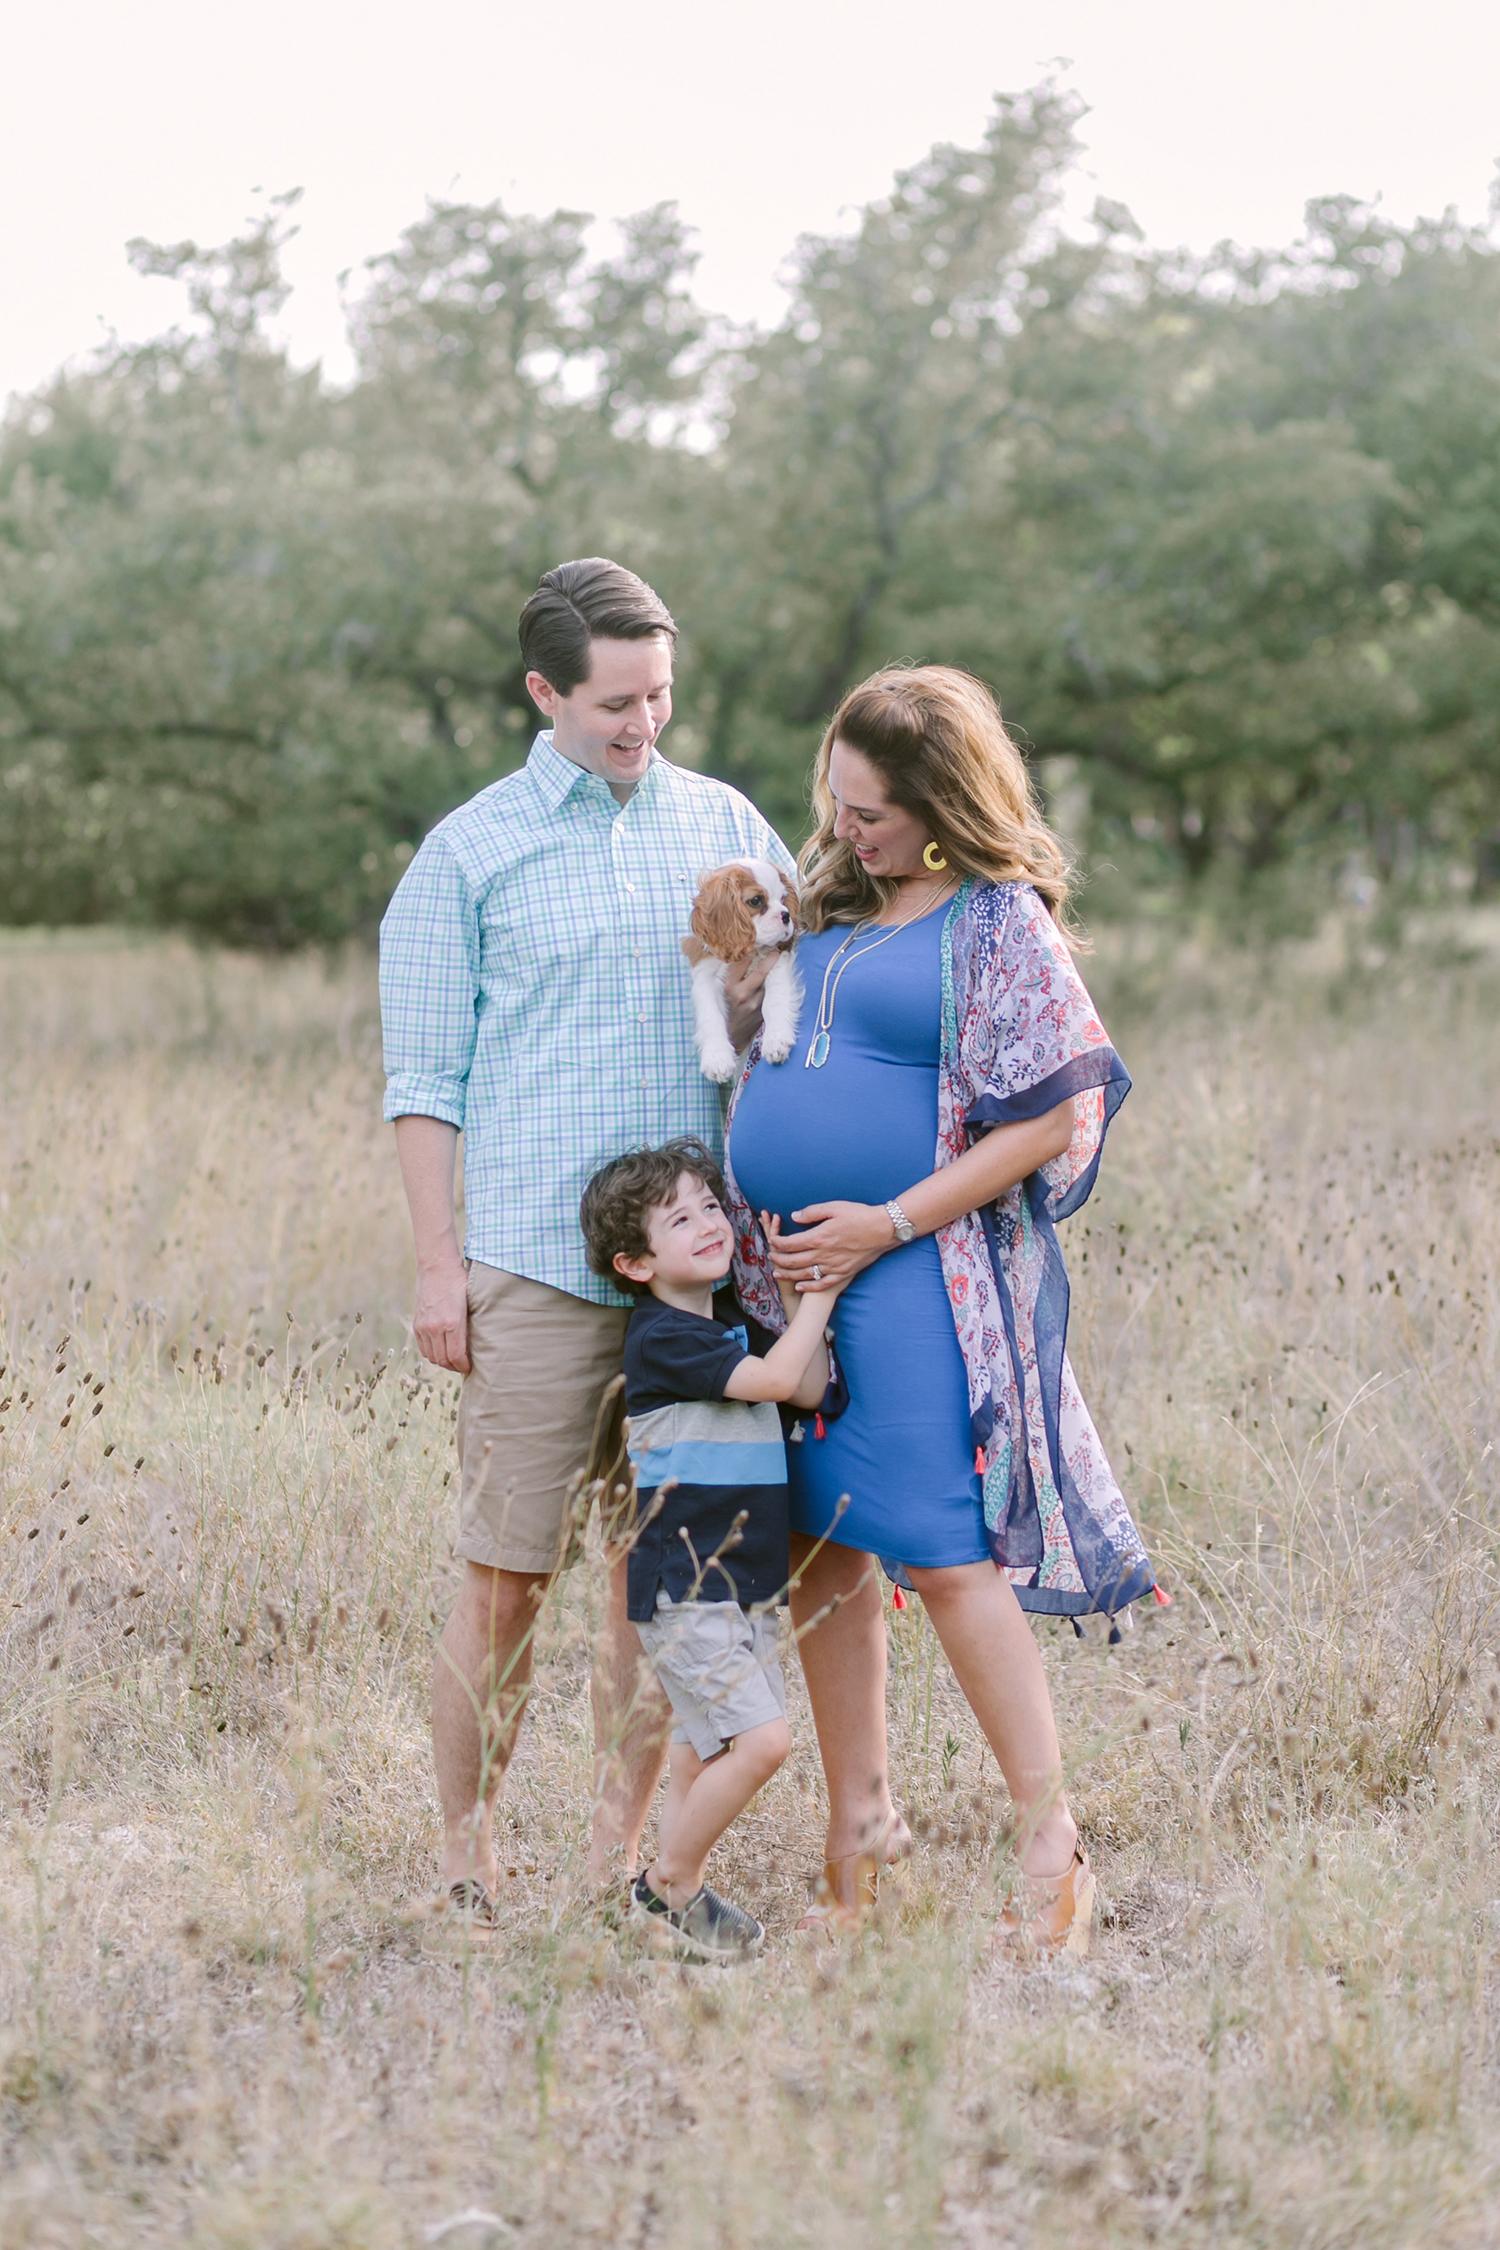 austin-tx-maternity-bump-photographer-03.jpg